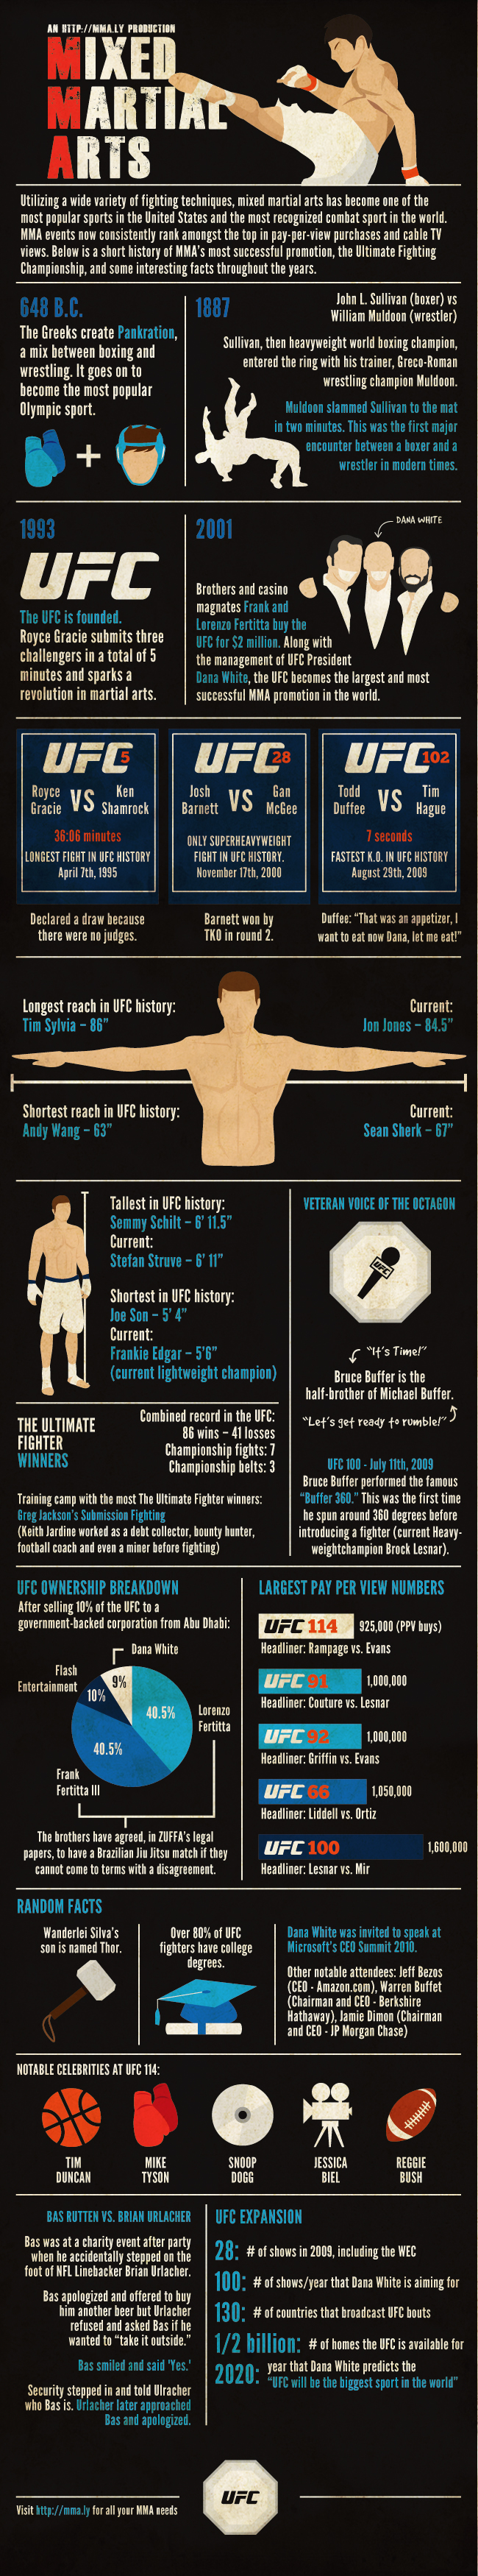 Martial Arts Industry Timeline